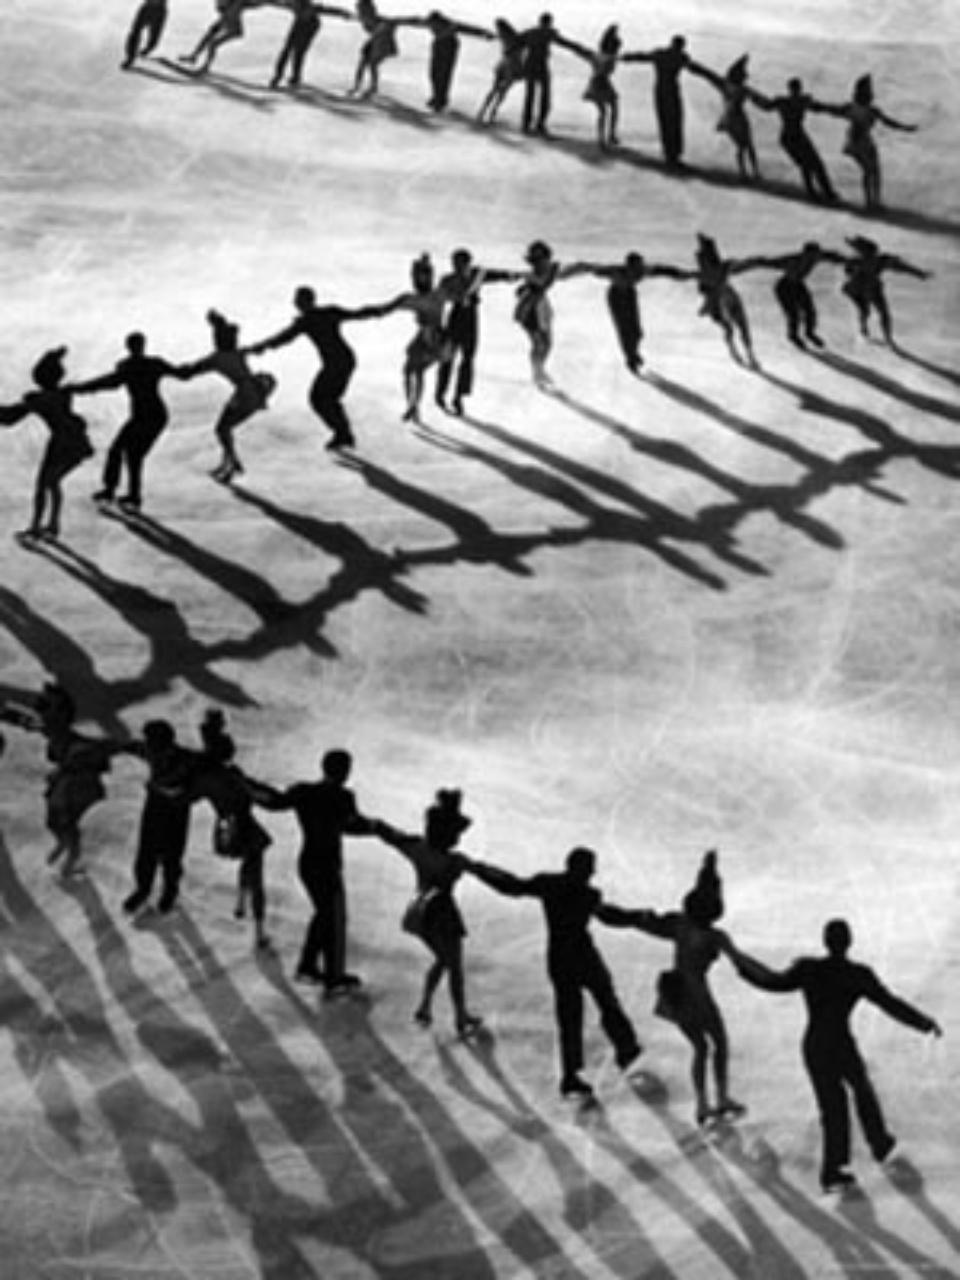 Gjon Mili Skaters of Hollywood Ice Revue at Madison Square Garden 1948 Gelatin silver print